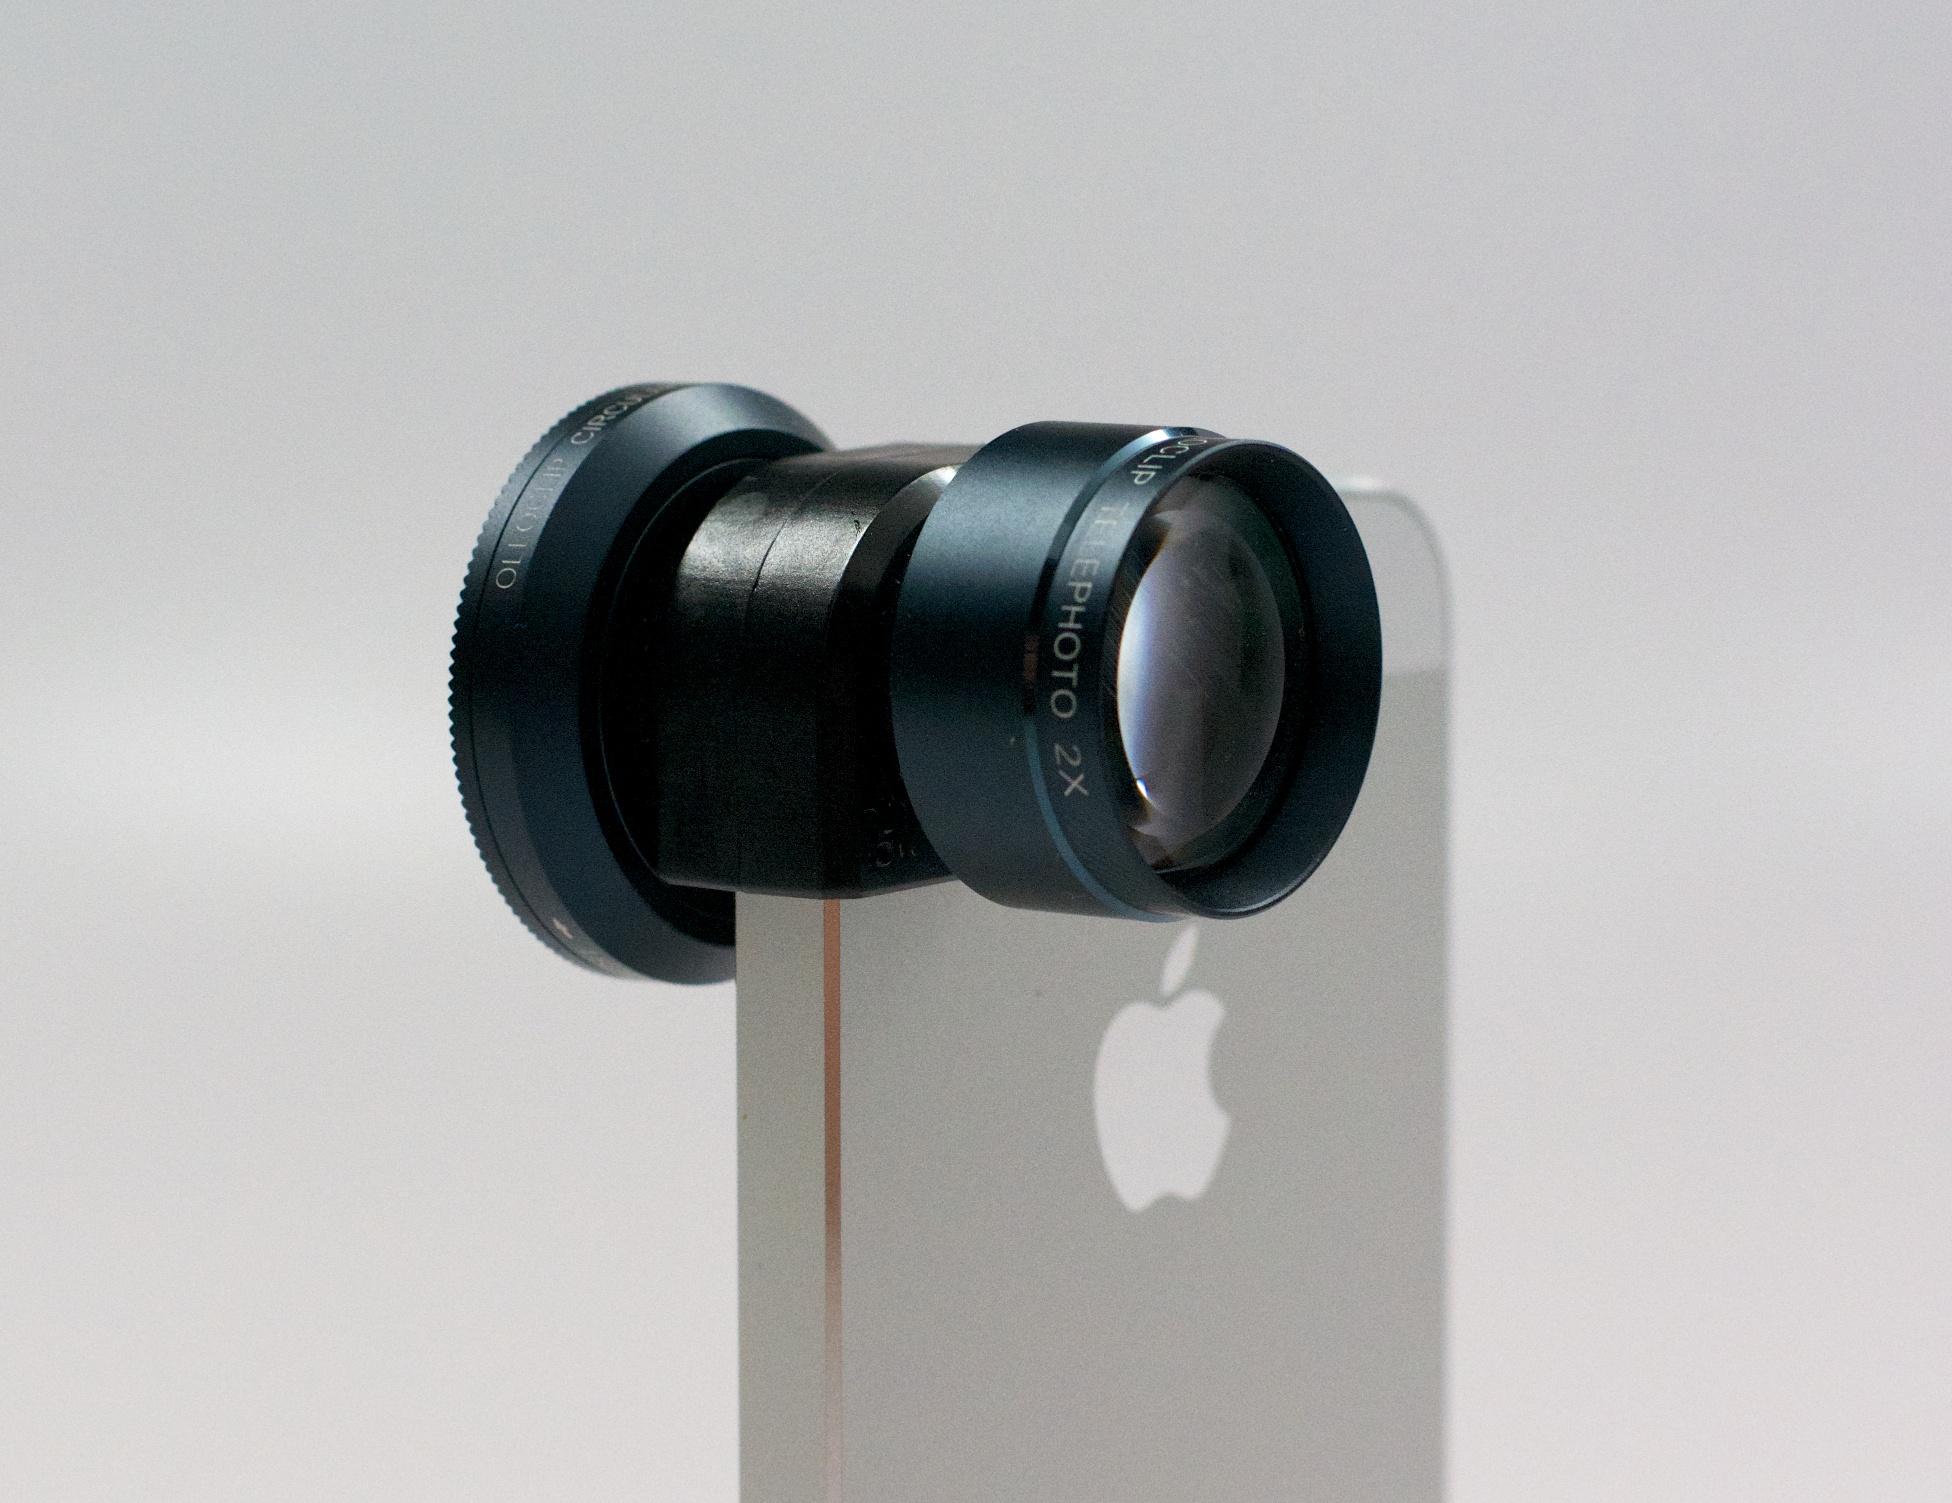 iPhone 5S Accessories